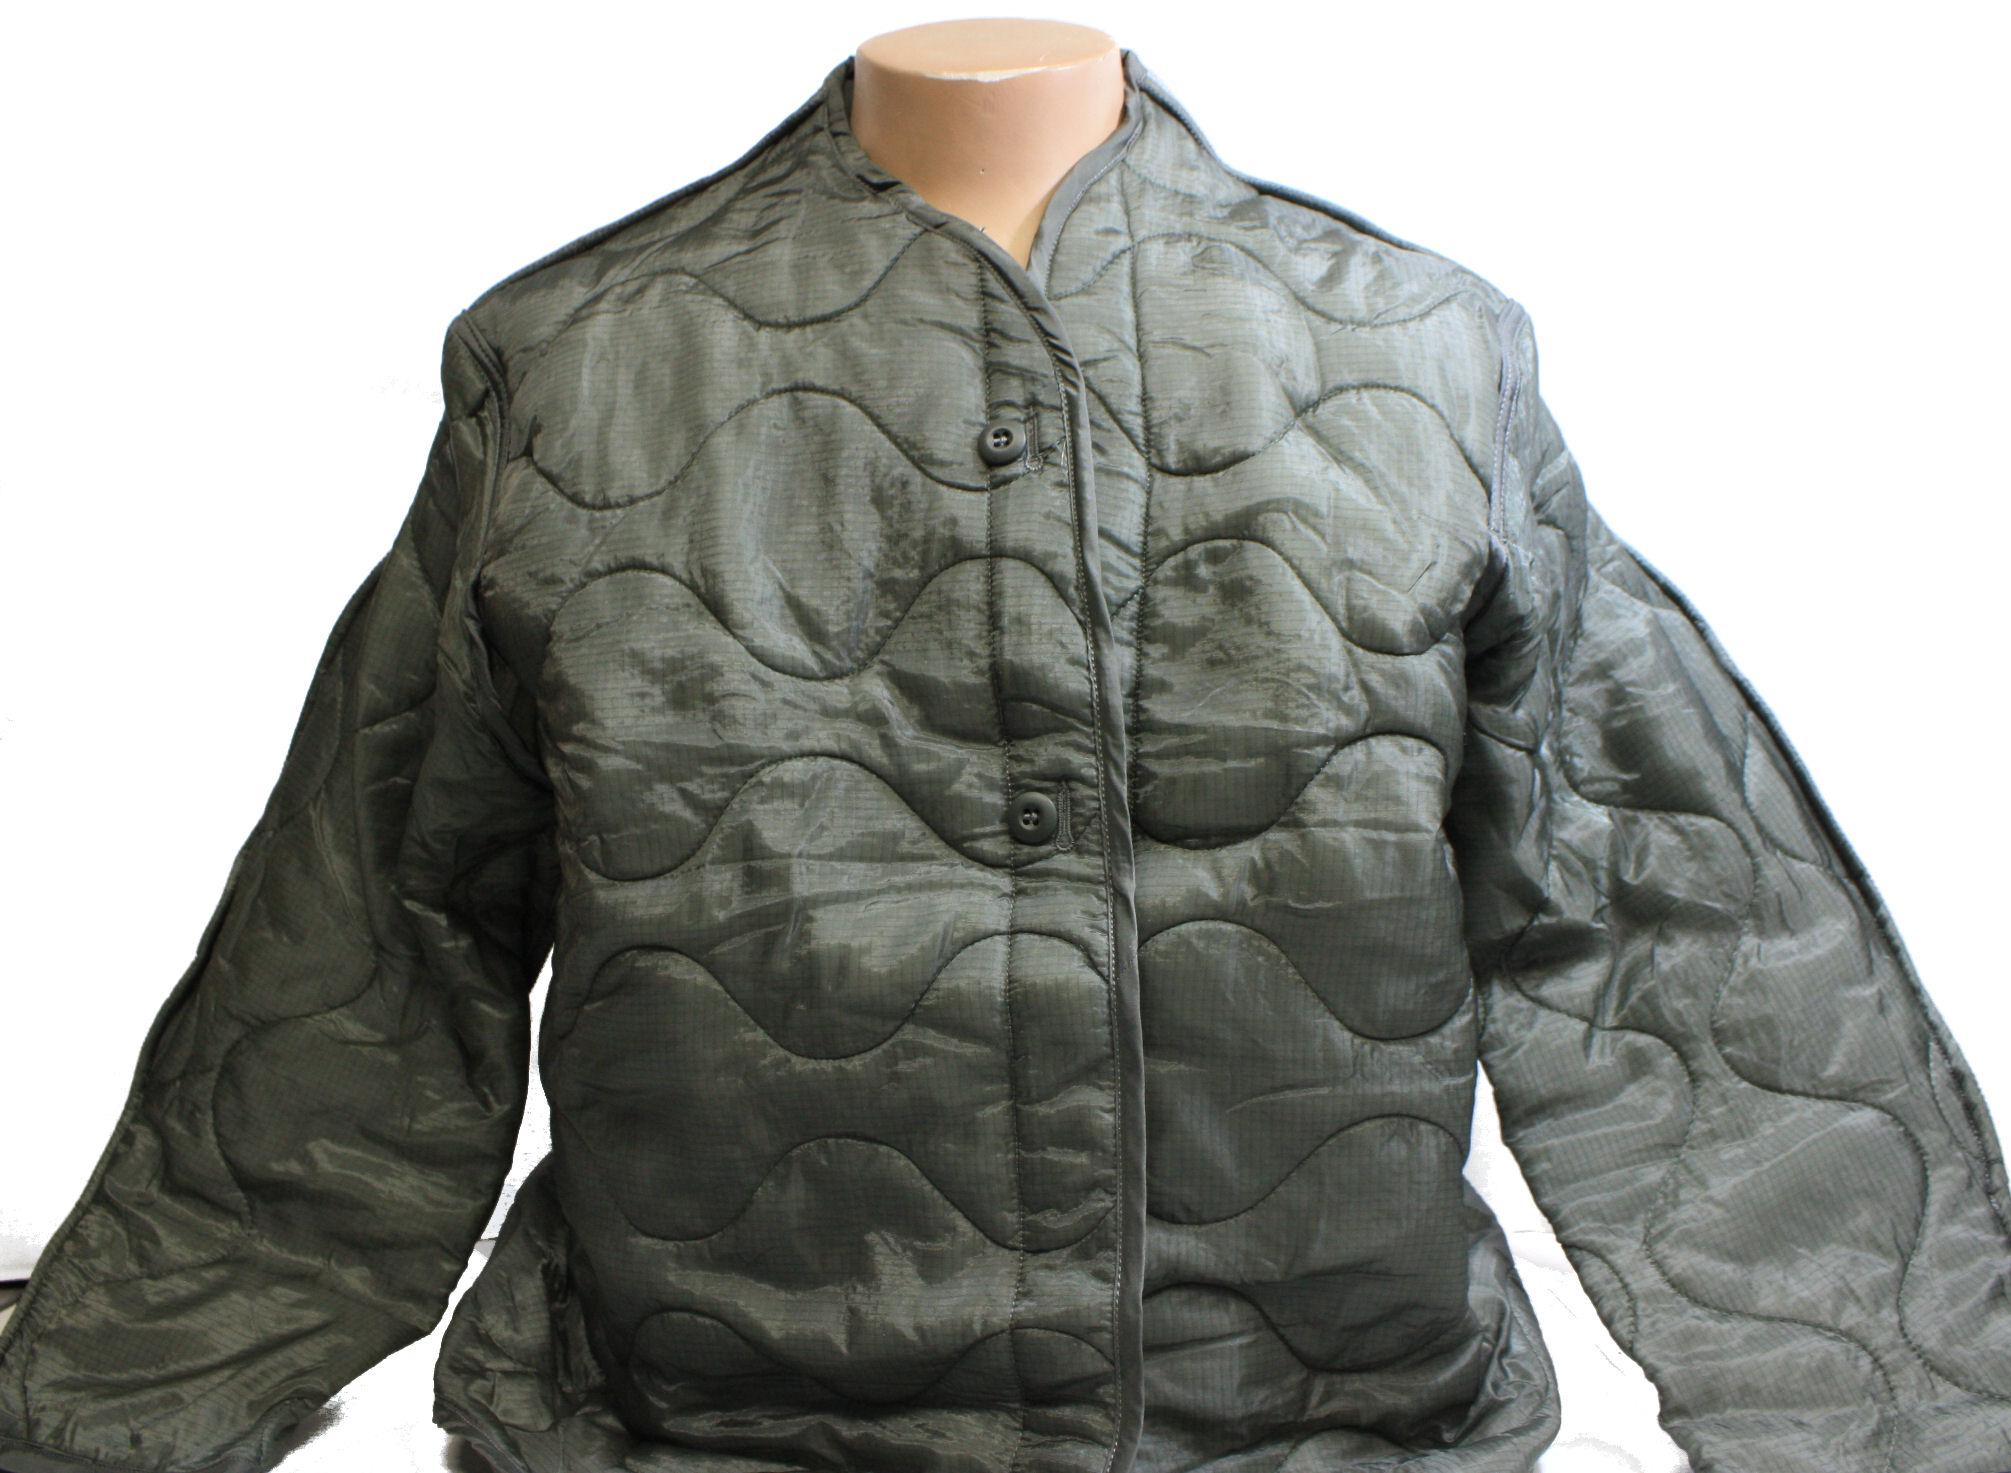 b4a59e9fc M-65 Field Jacket Liner, New, Original GI